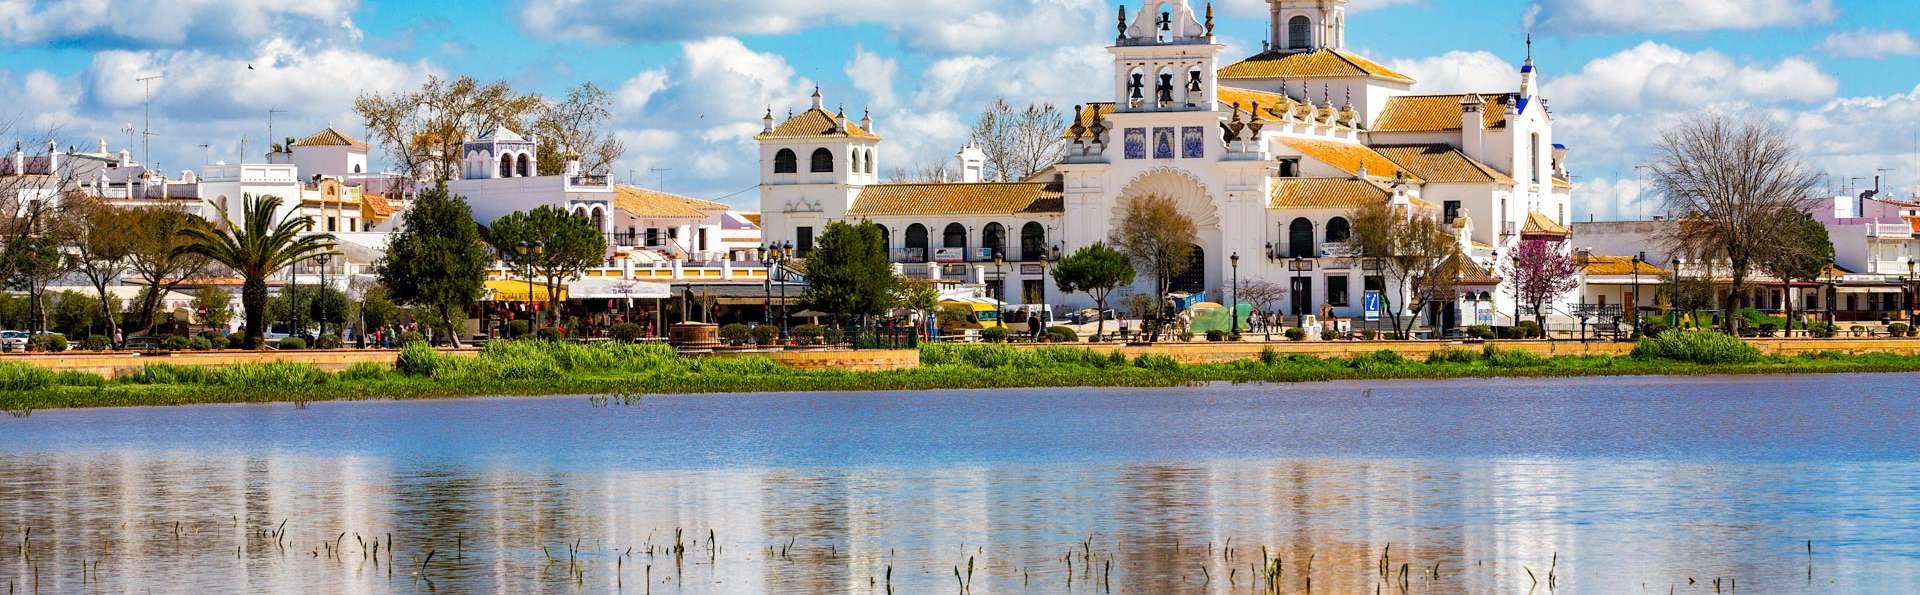 Precise Resort El Rompido - The Club - EDIT_DESTINATION_02.jpg